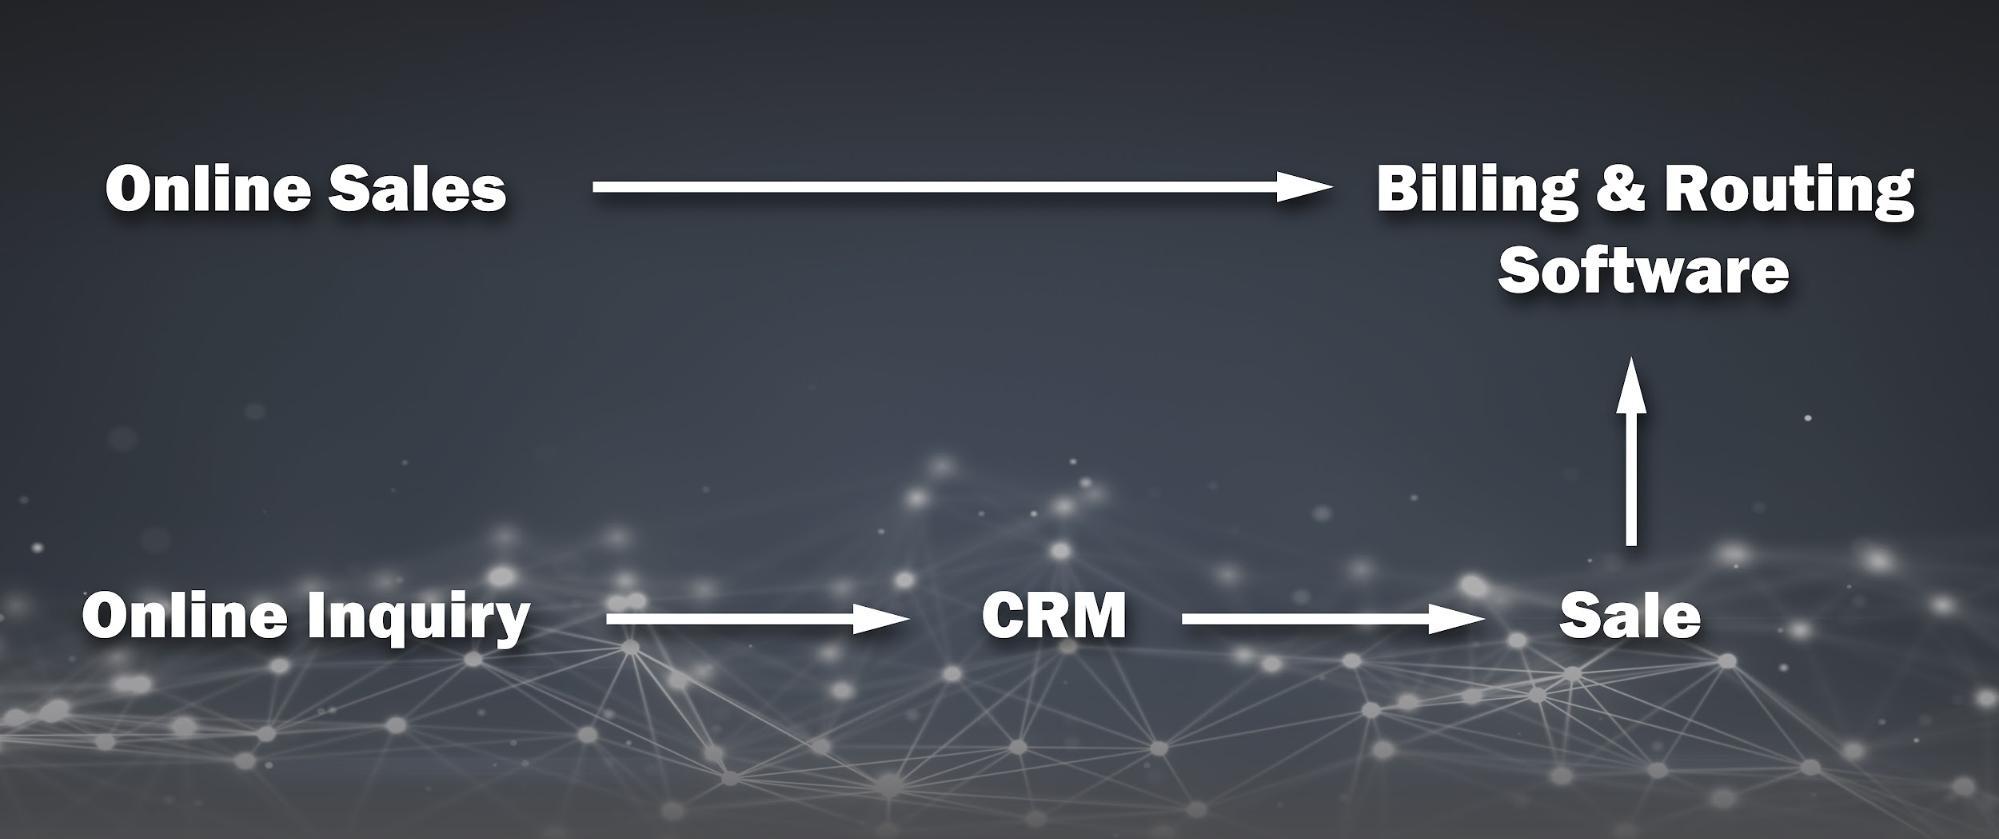 Flow diagram with sales